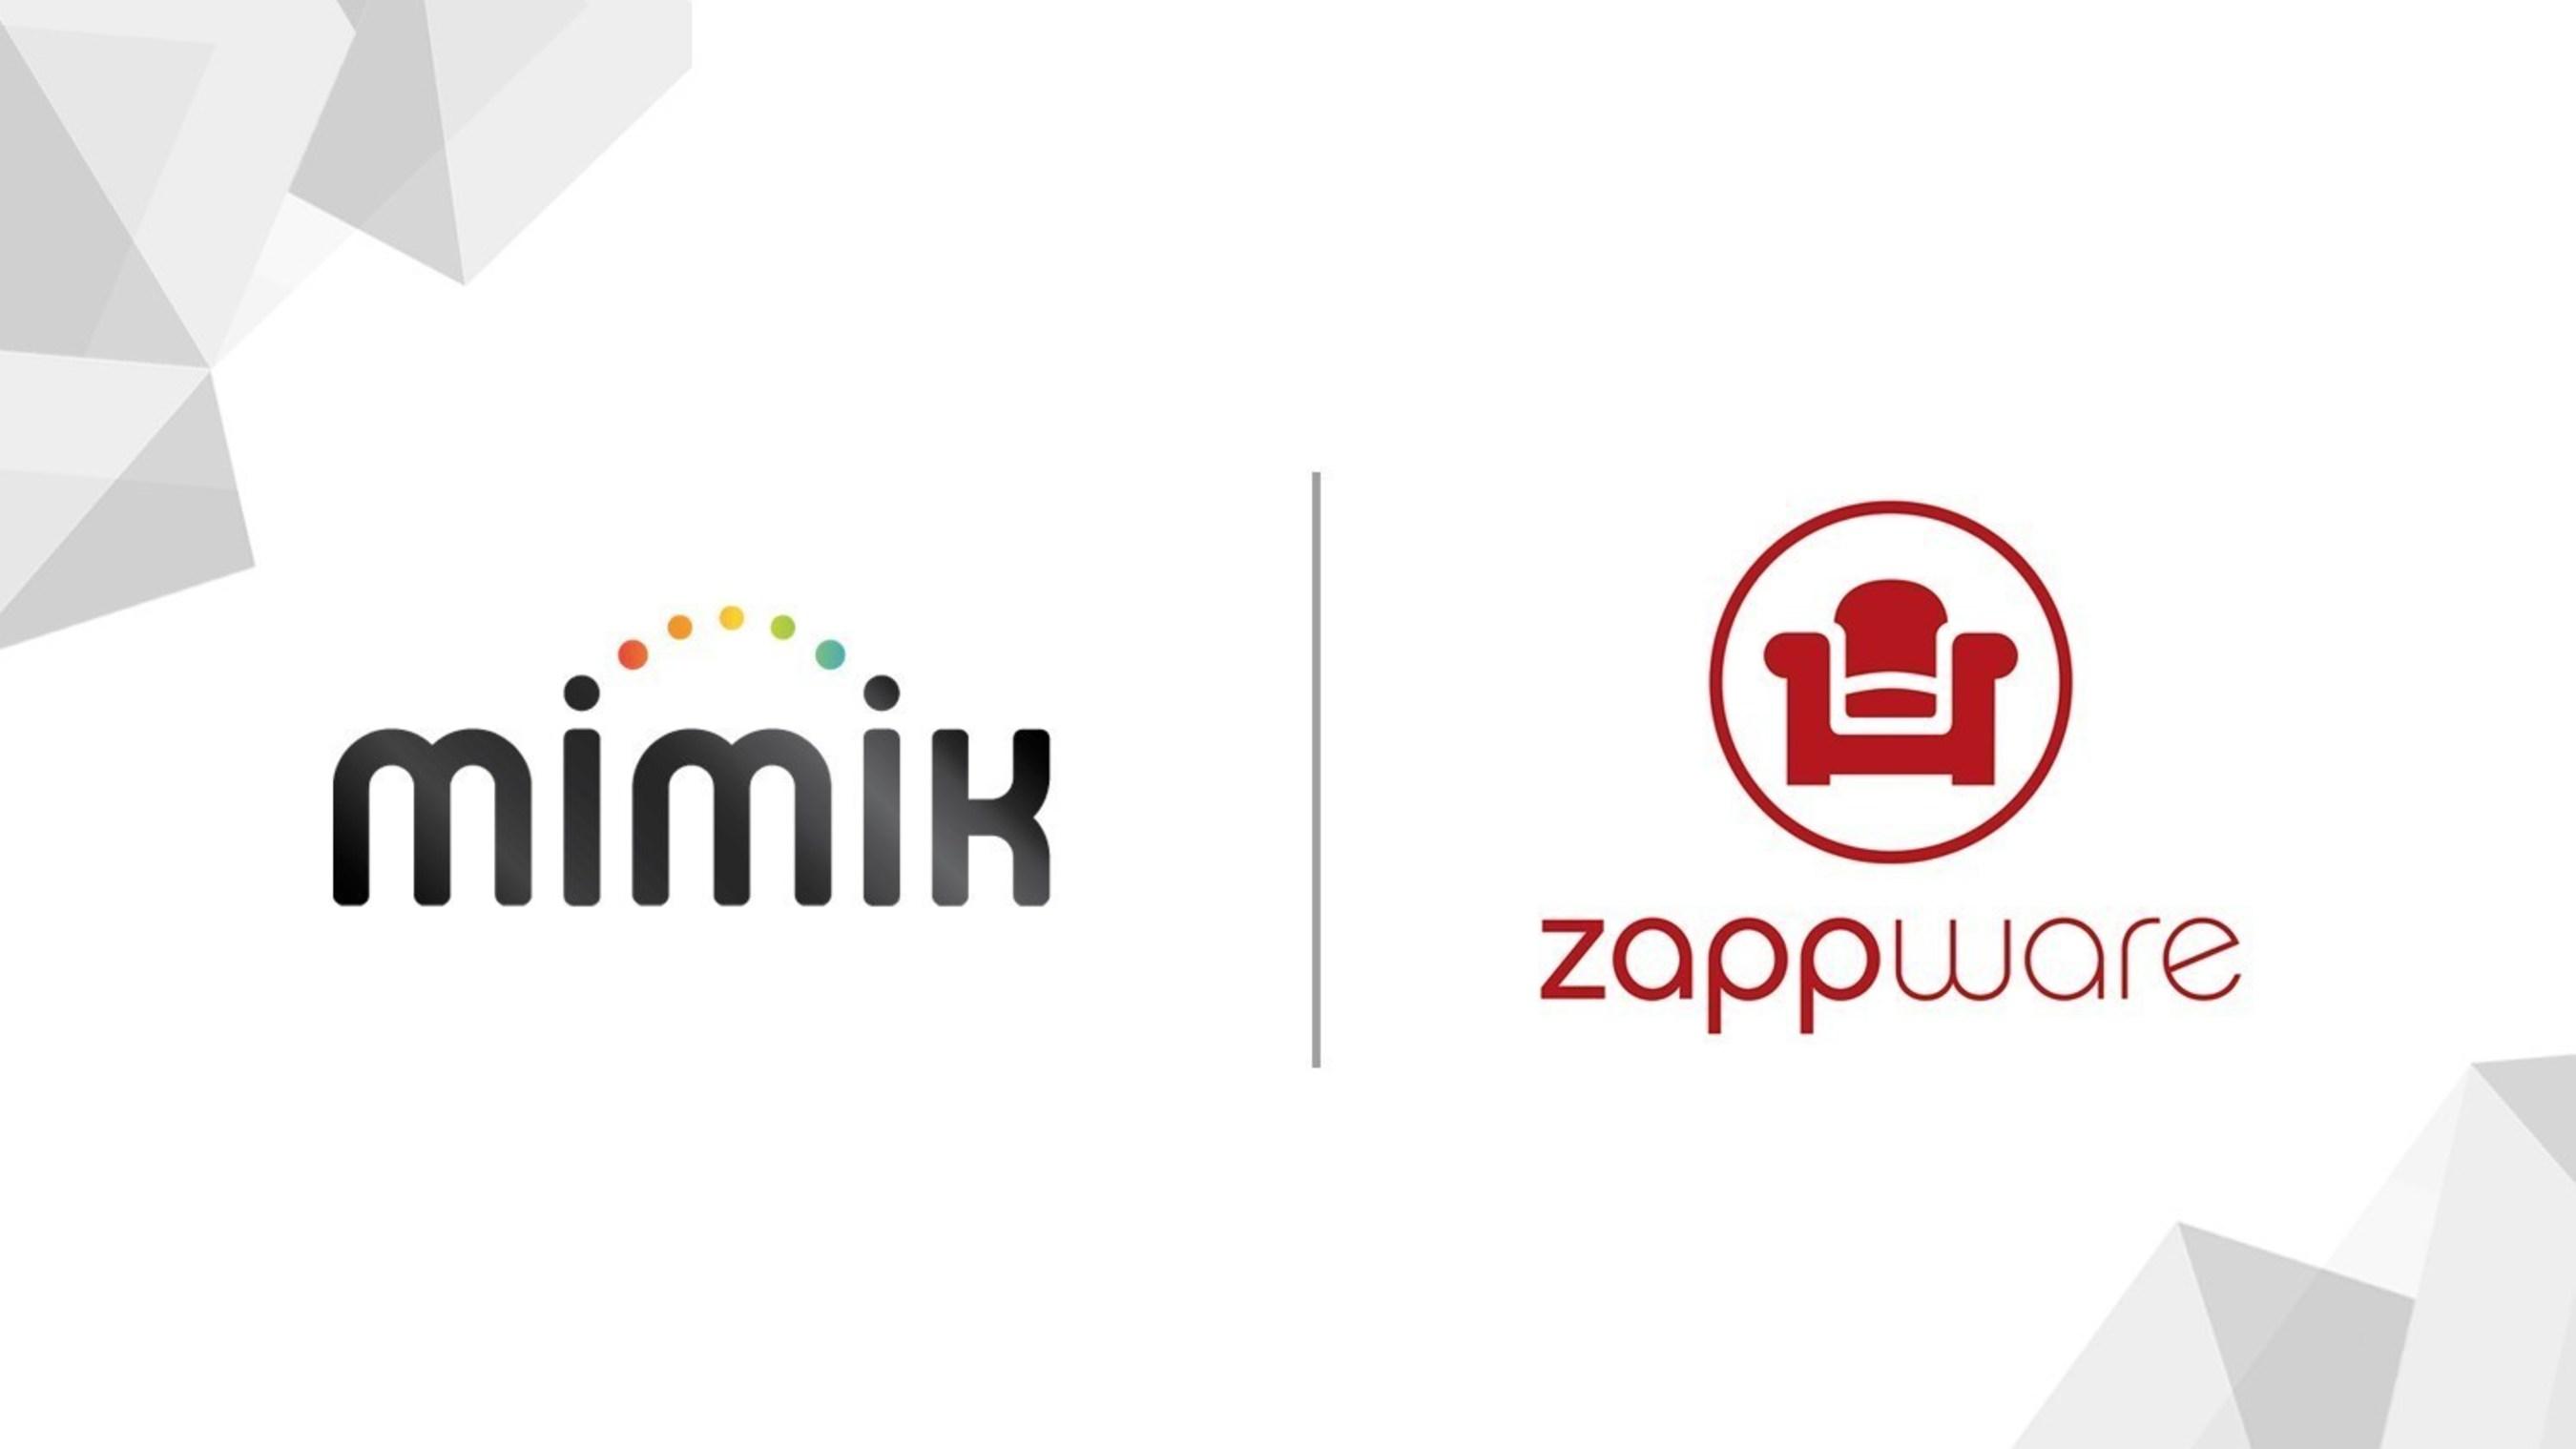 mimik and Zappware Announce Strategic Partnership